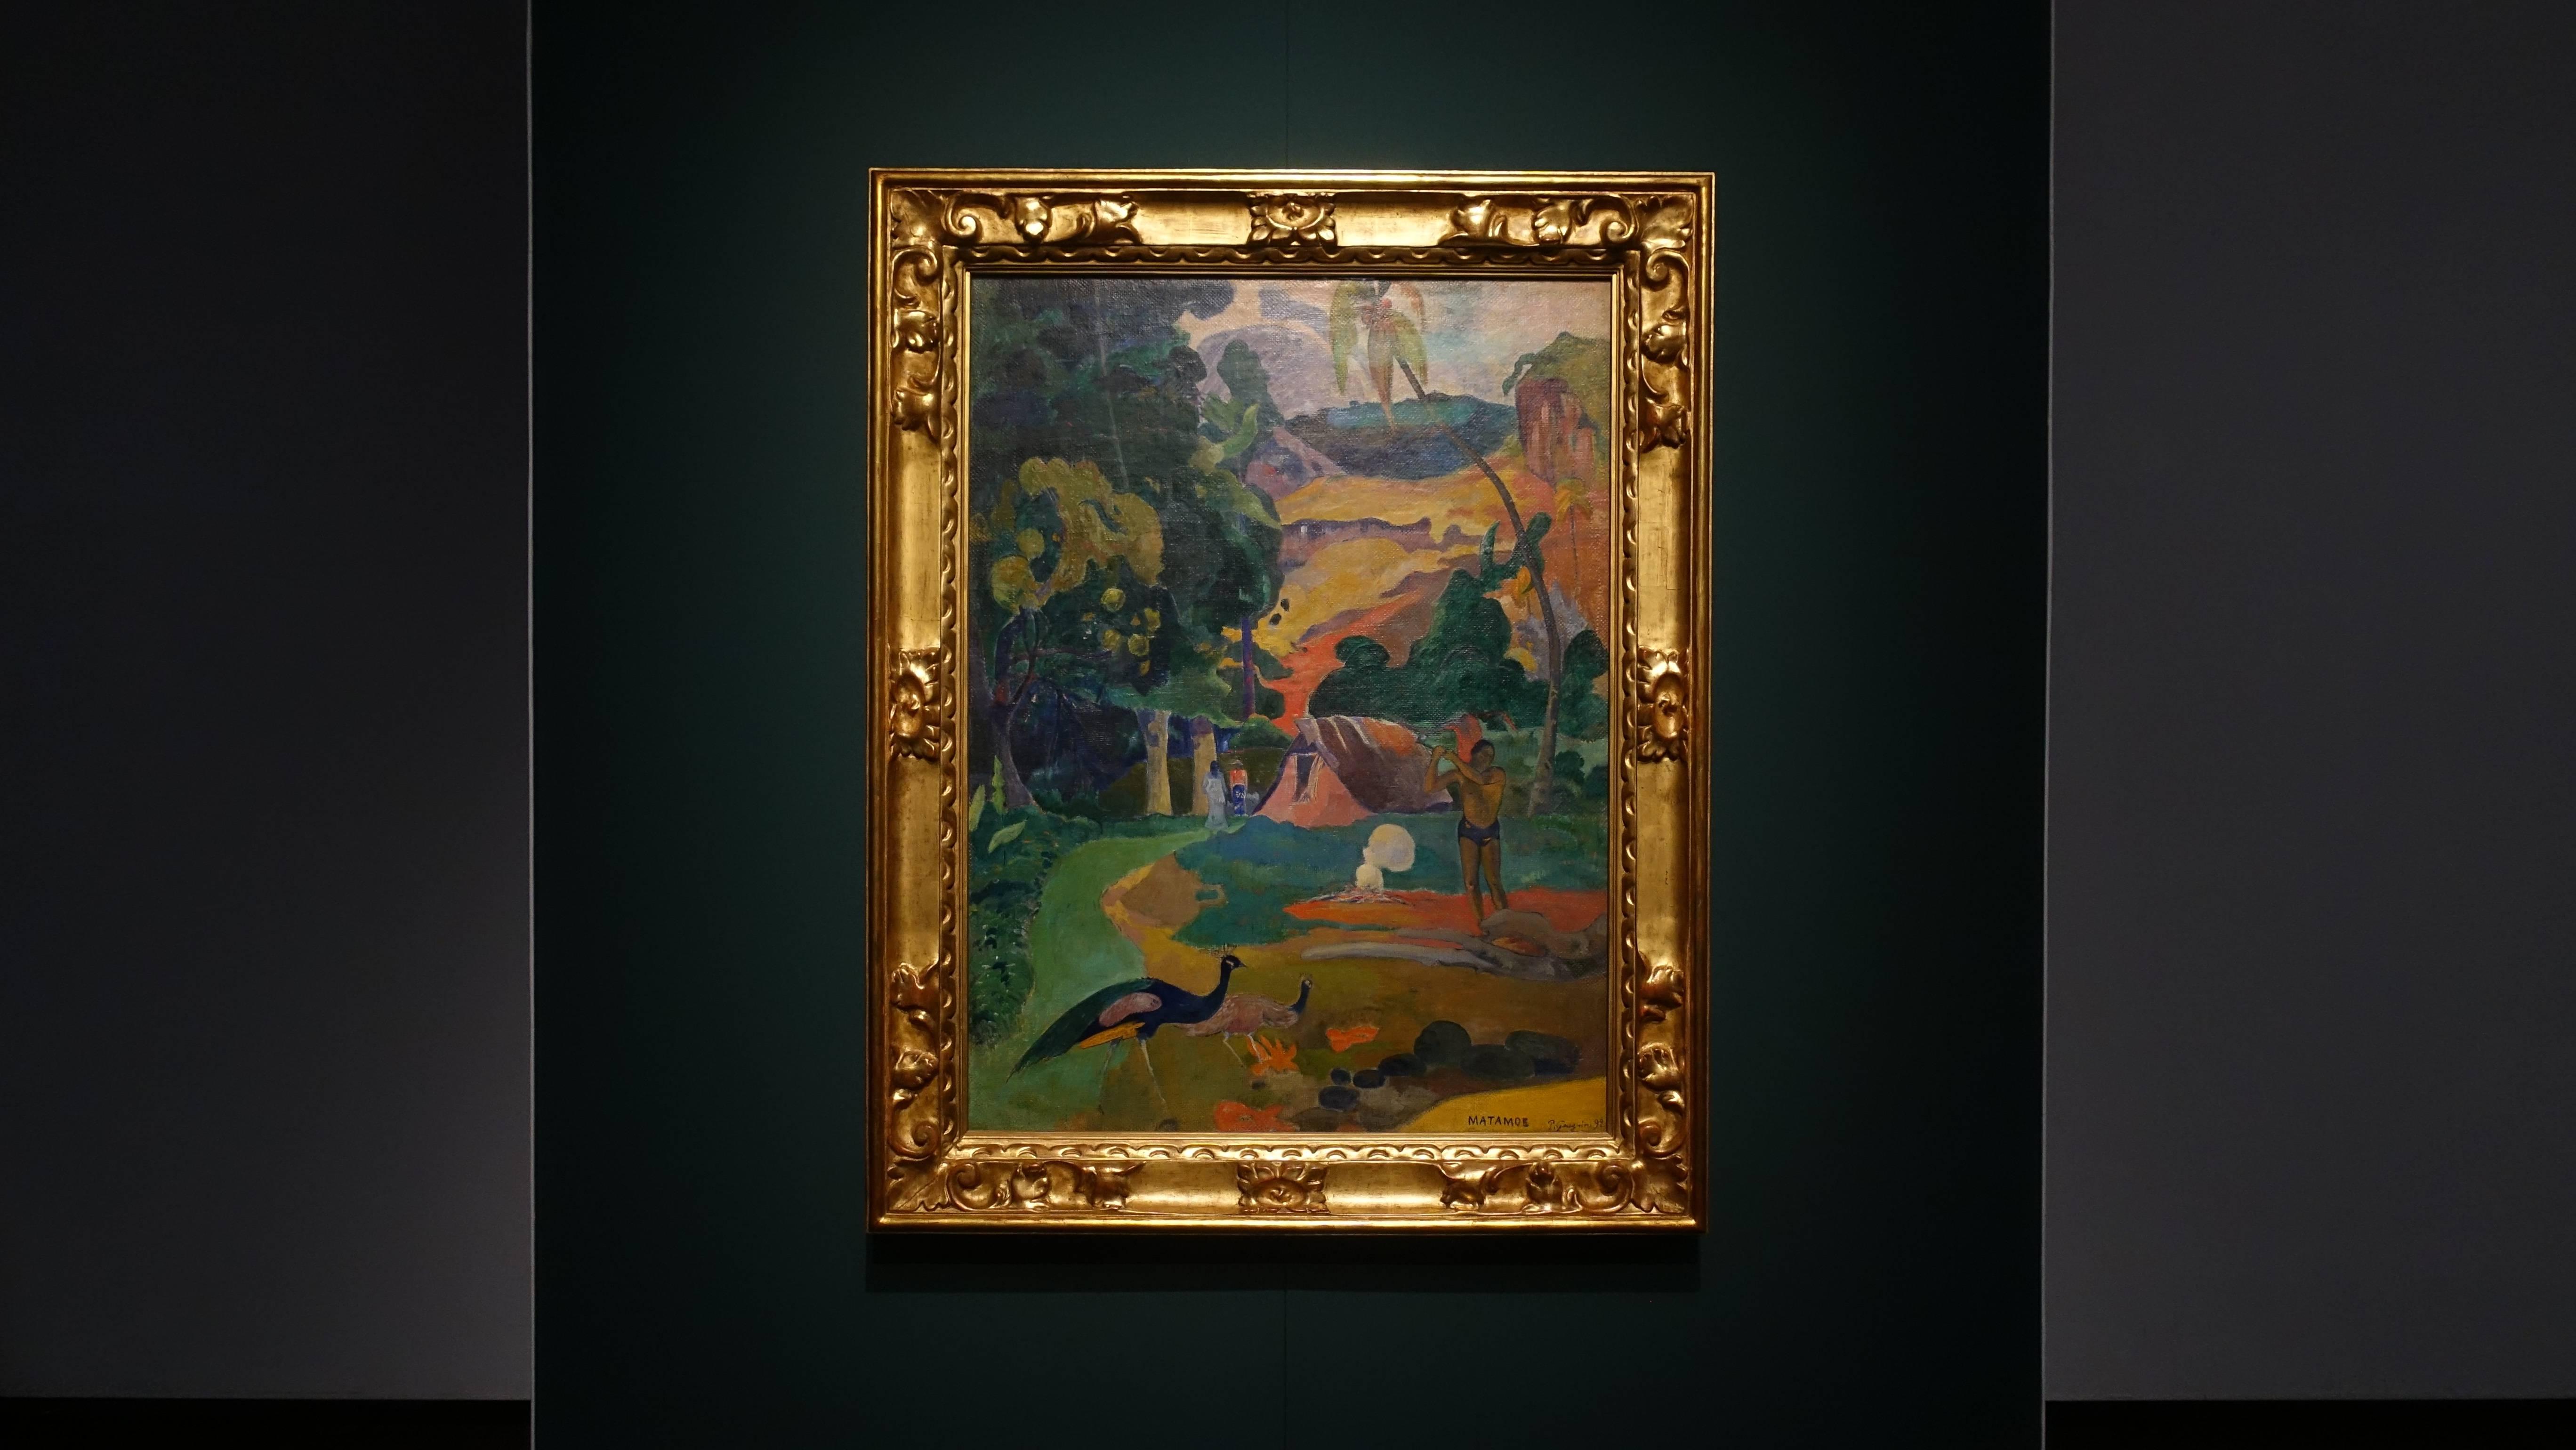 保羅•高更 Paul Gauguin,《有孔雀的風景MATAMOE. Landscape with Peacocks》,油彩、畫布 Oil on canvas,1892。